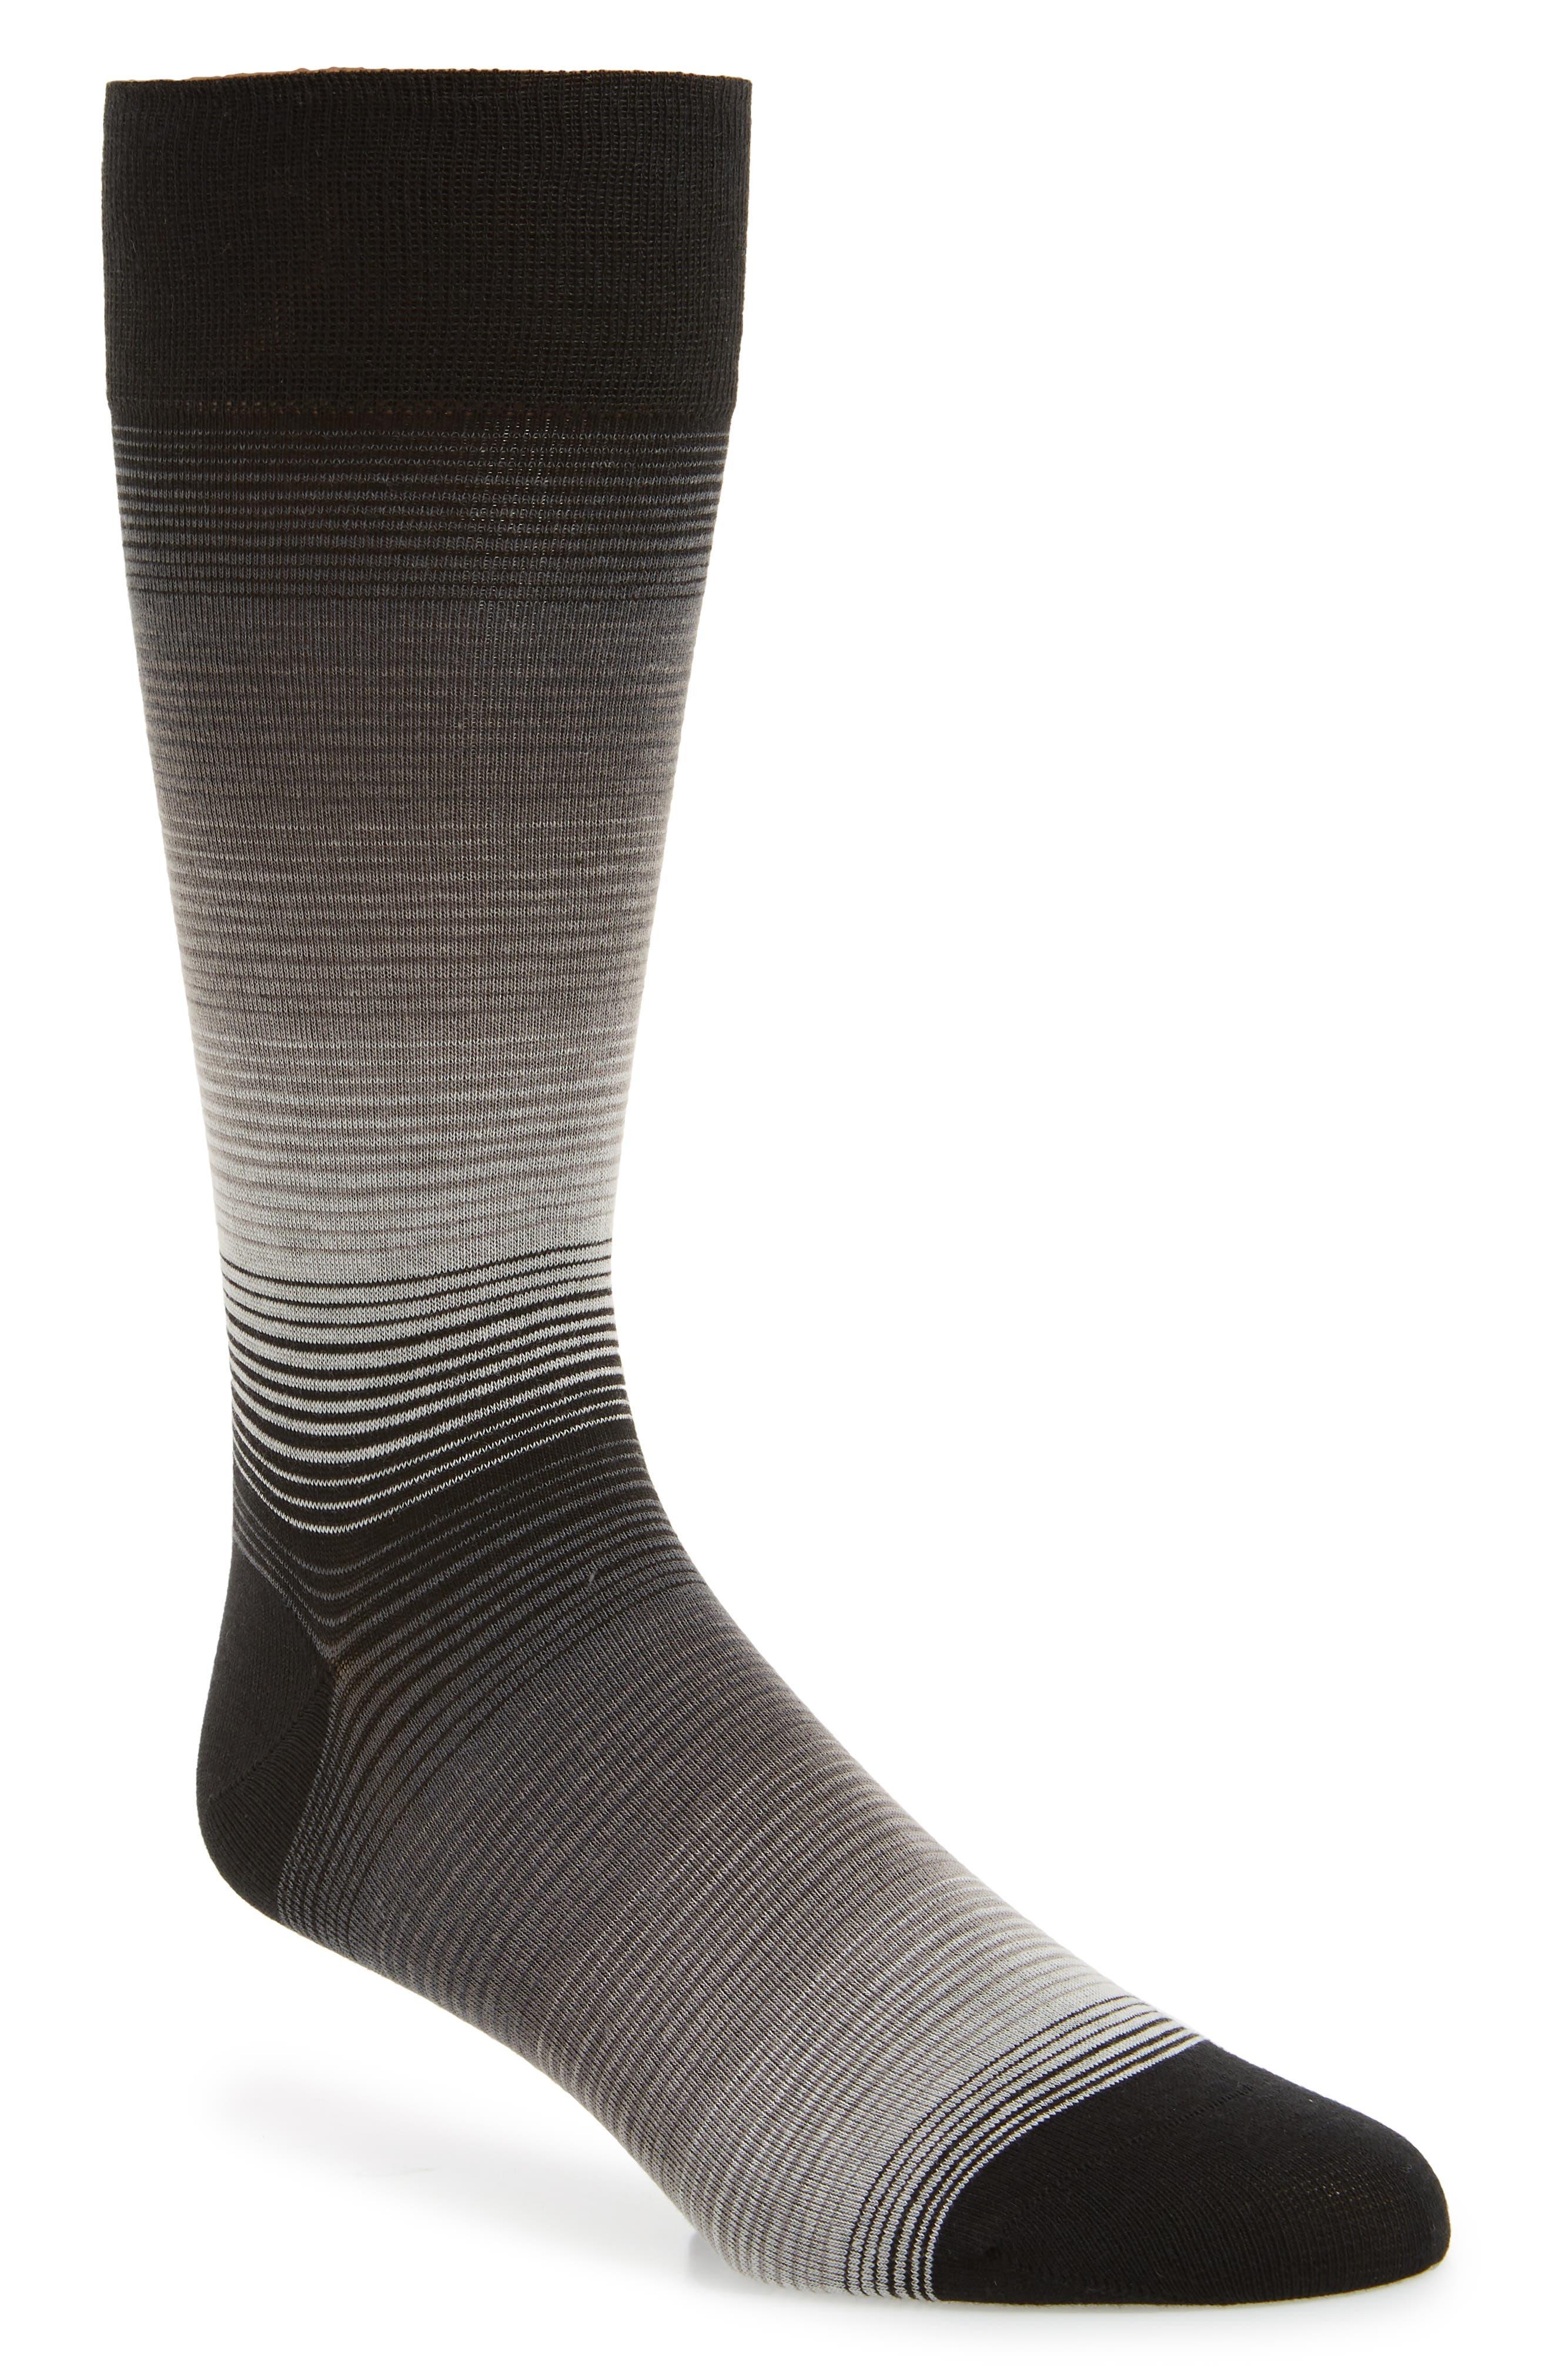 Gradient Stripe Socks,                             Main thumbnail 1, color,                             BLACK